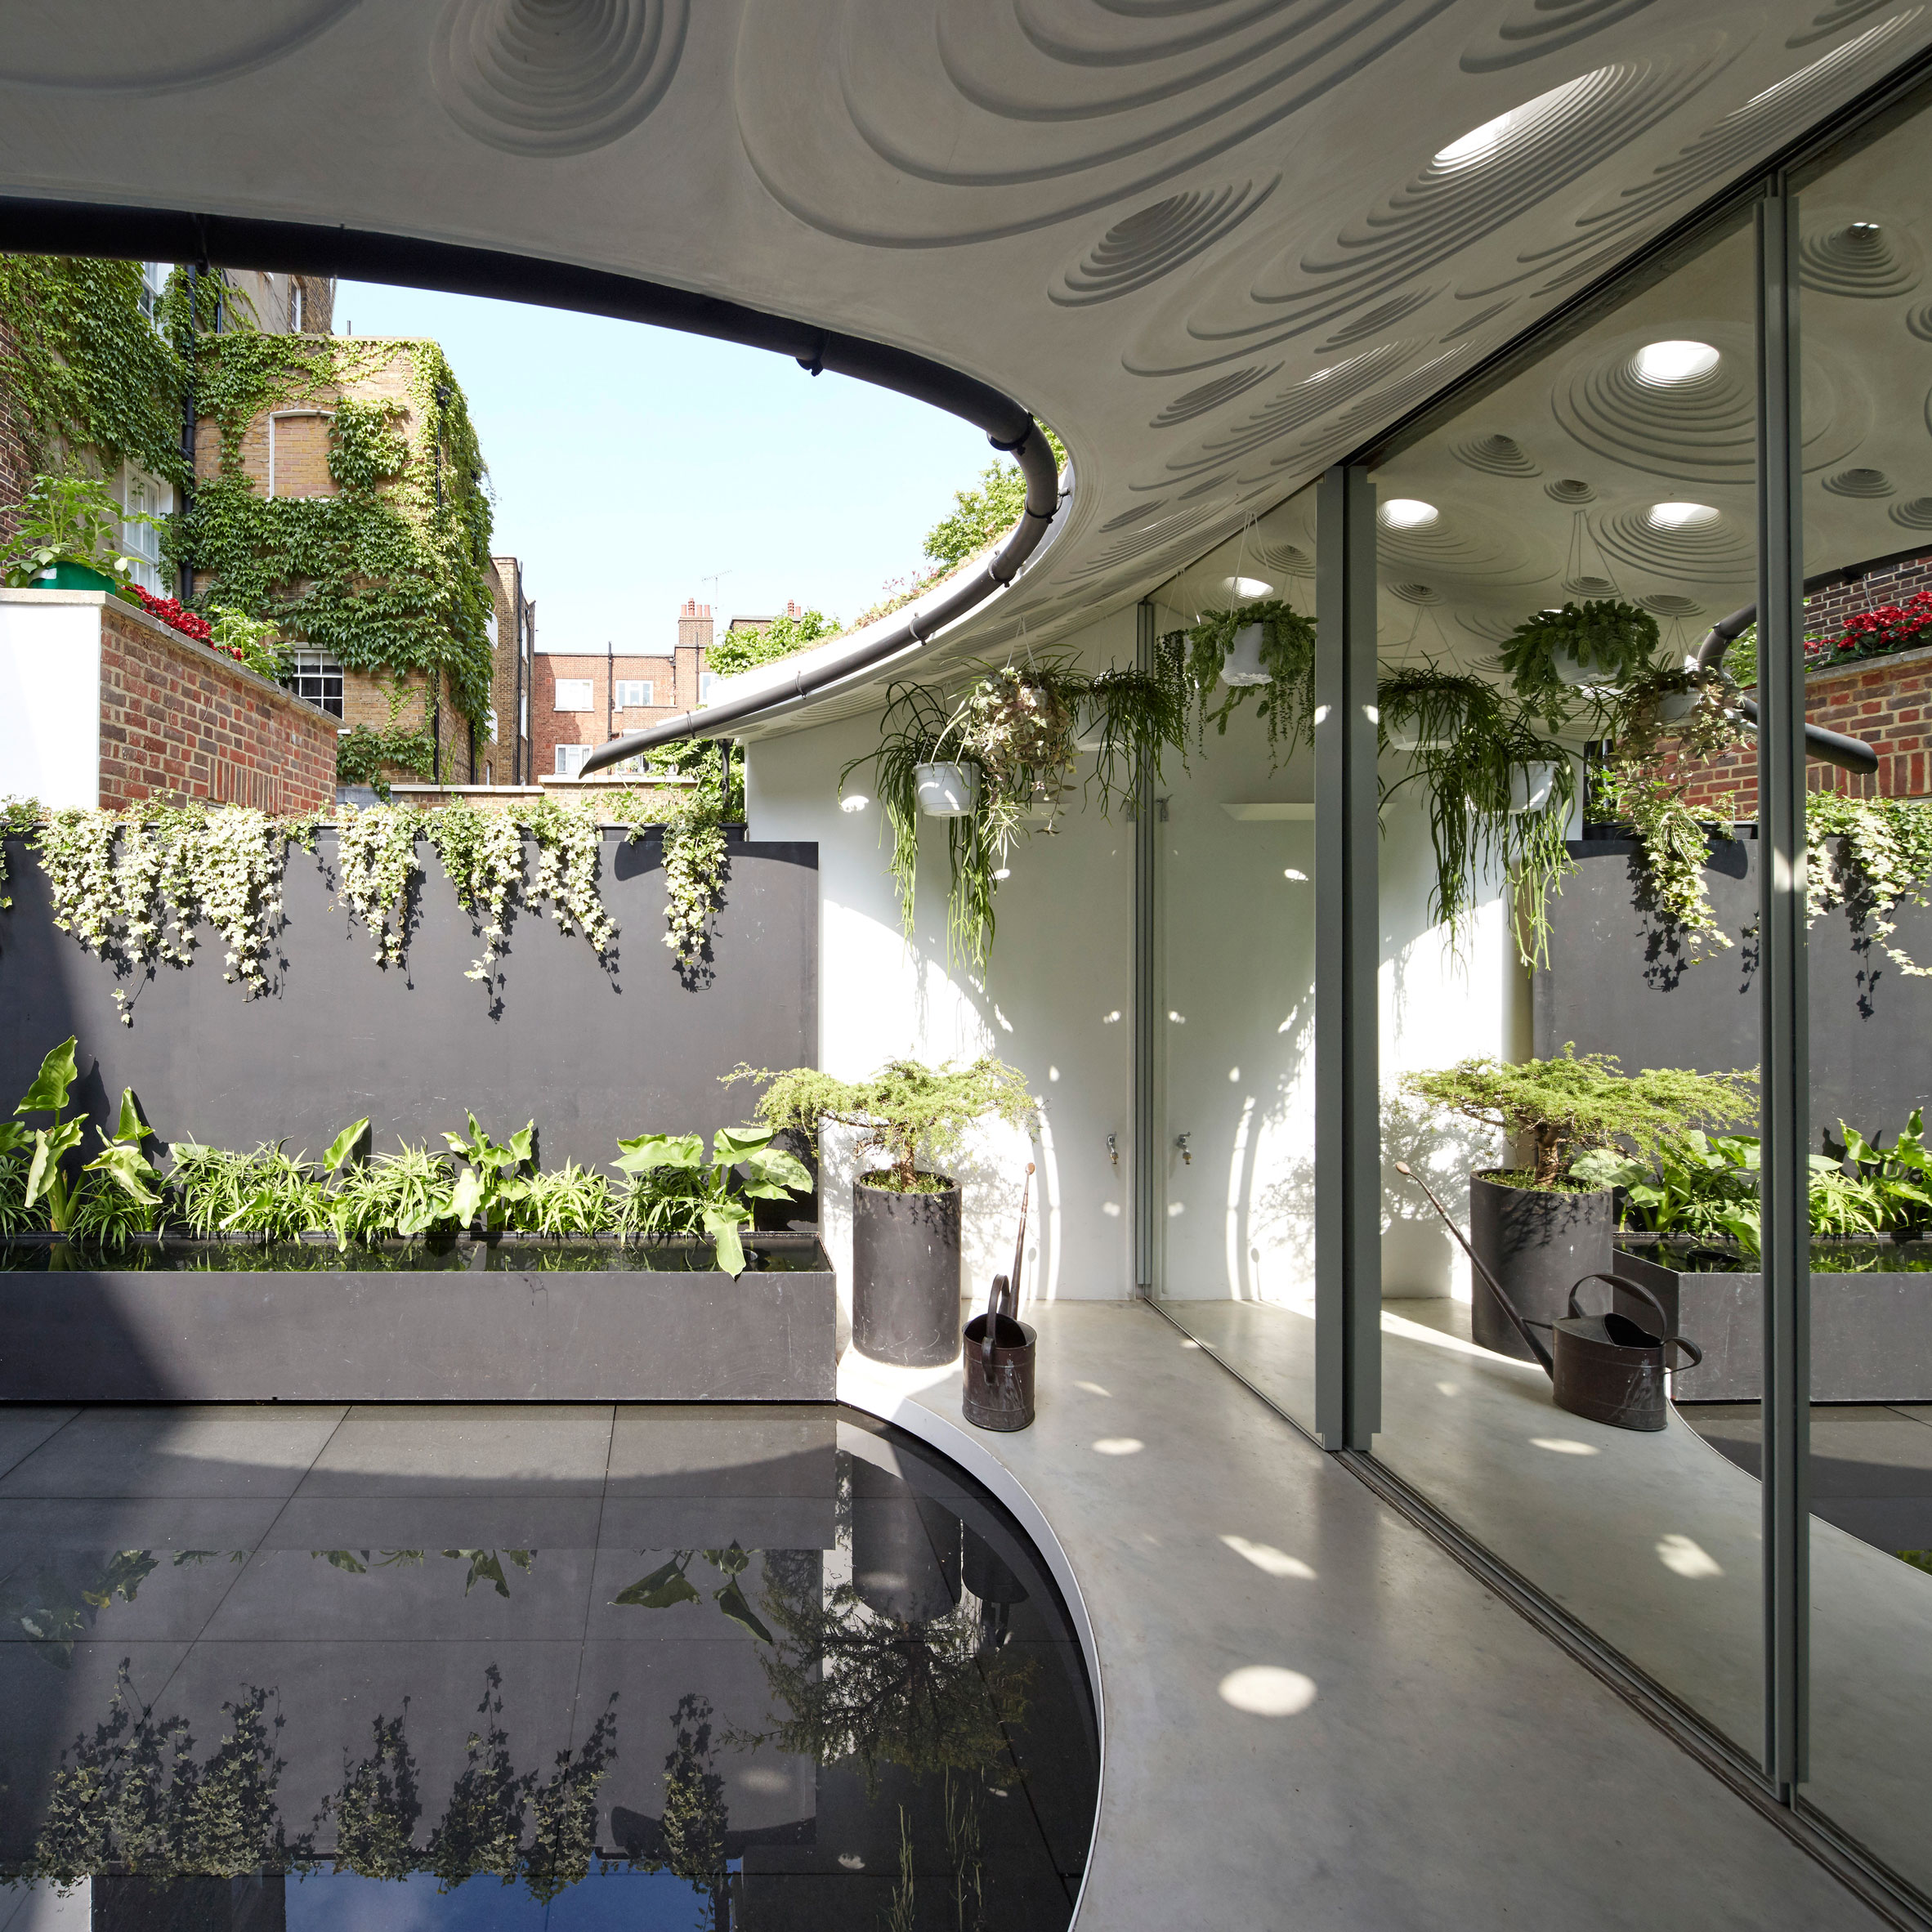 Sun Rain Rooms Named Londonu0027s Best New House Extension In Donu0027t Move,  Improve! 2018